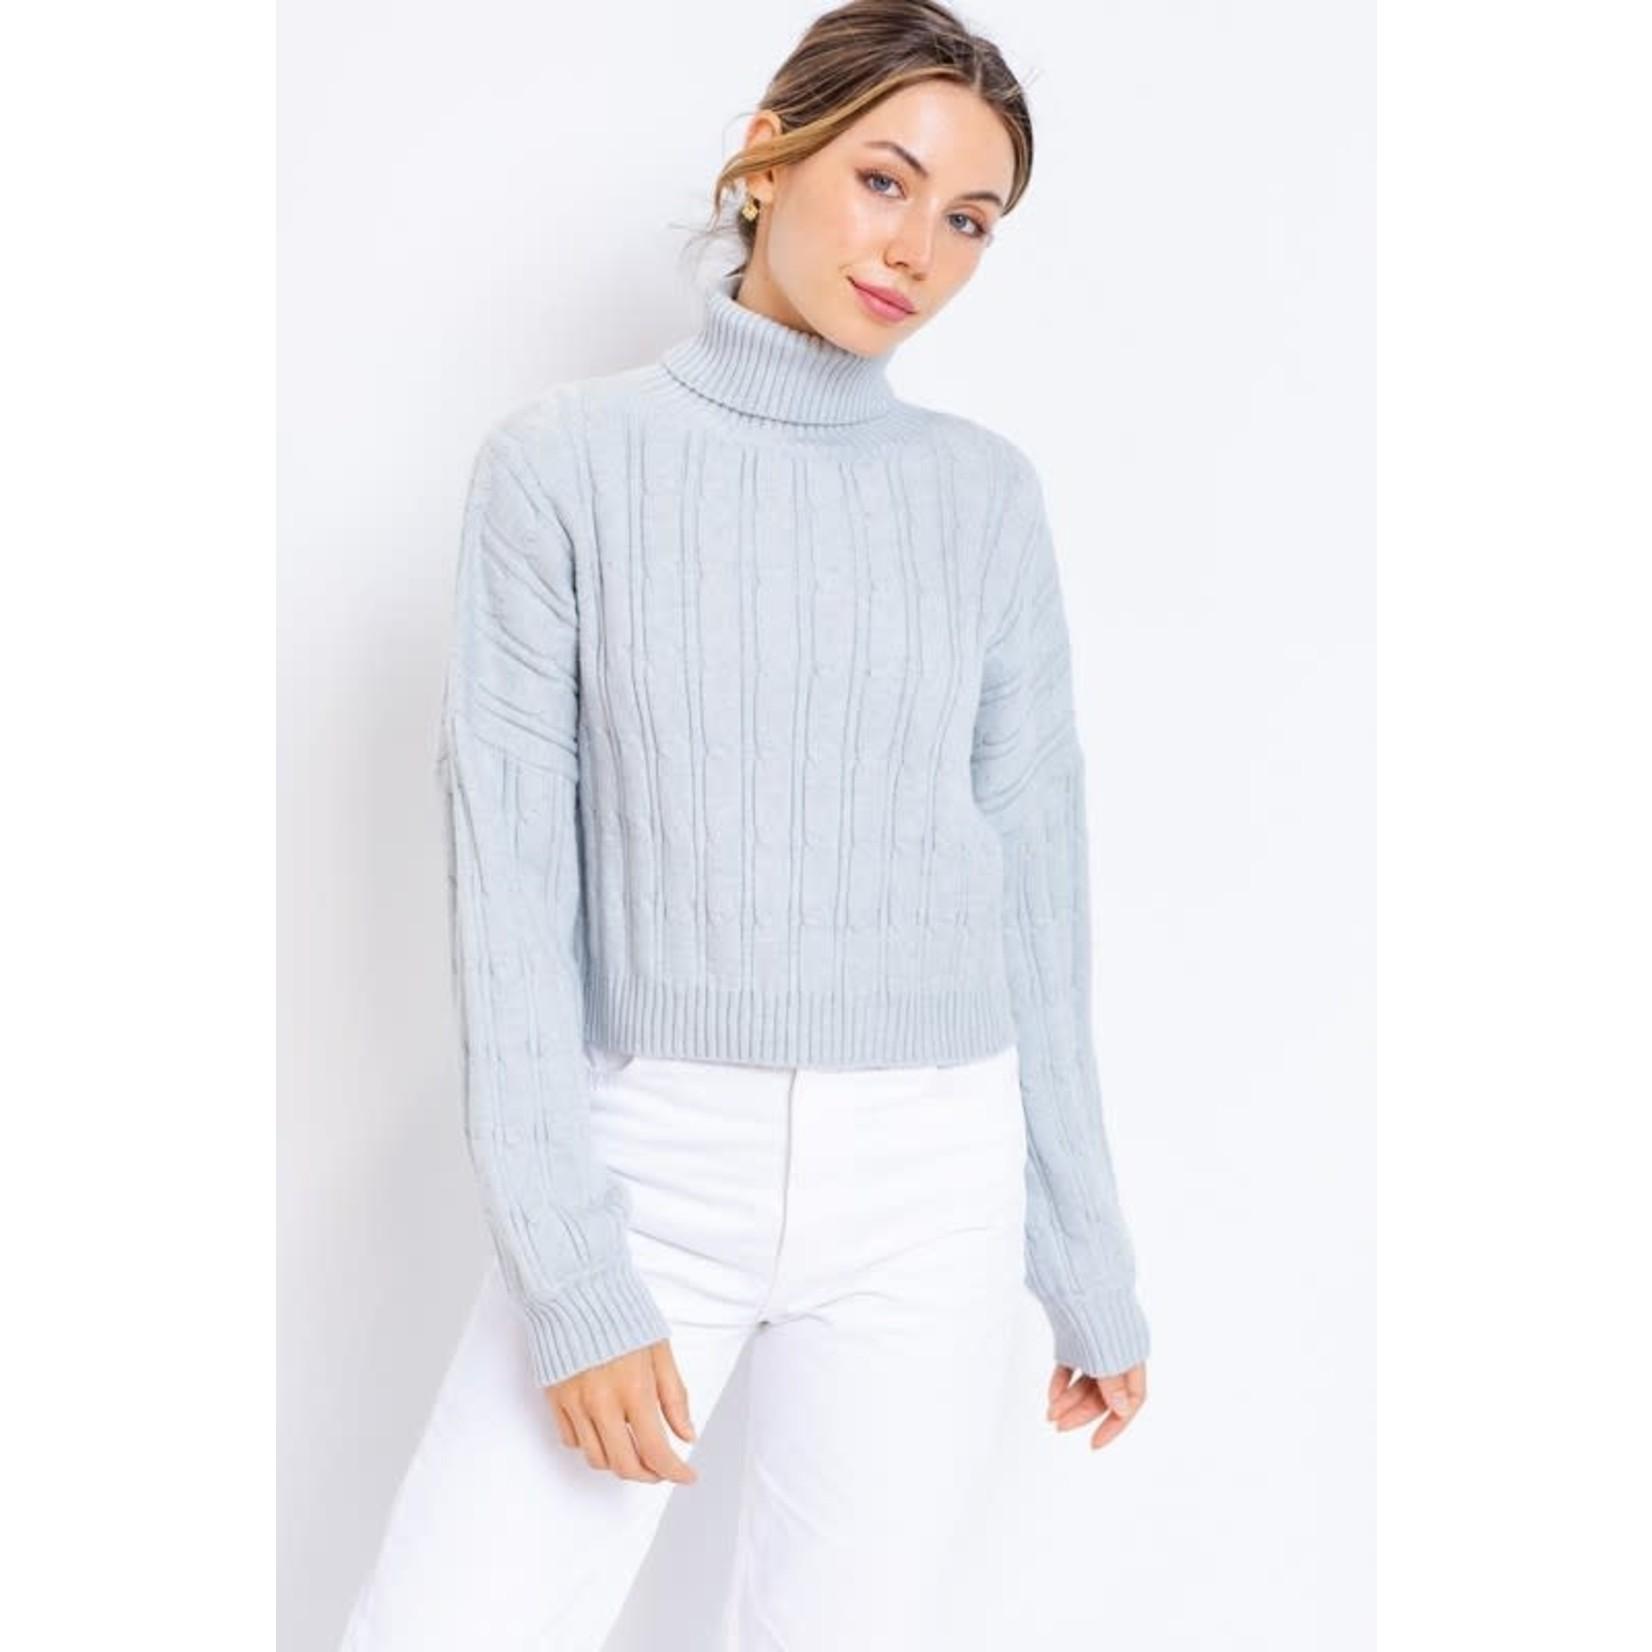 EM & ELLE Callahan Turtleneck Sweater